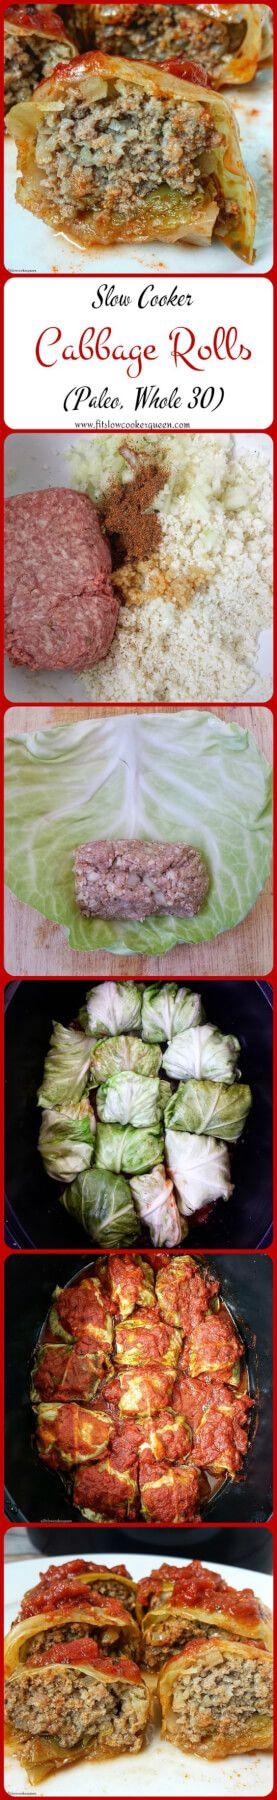 Paleo Crock Pot Cabbage Rolls Recipe